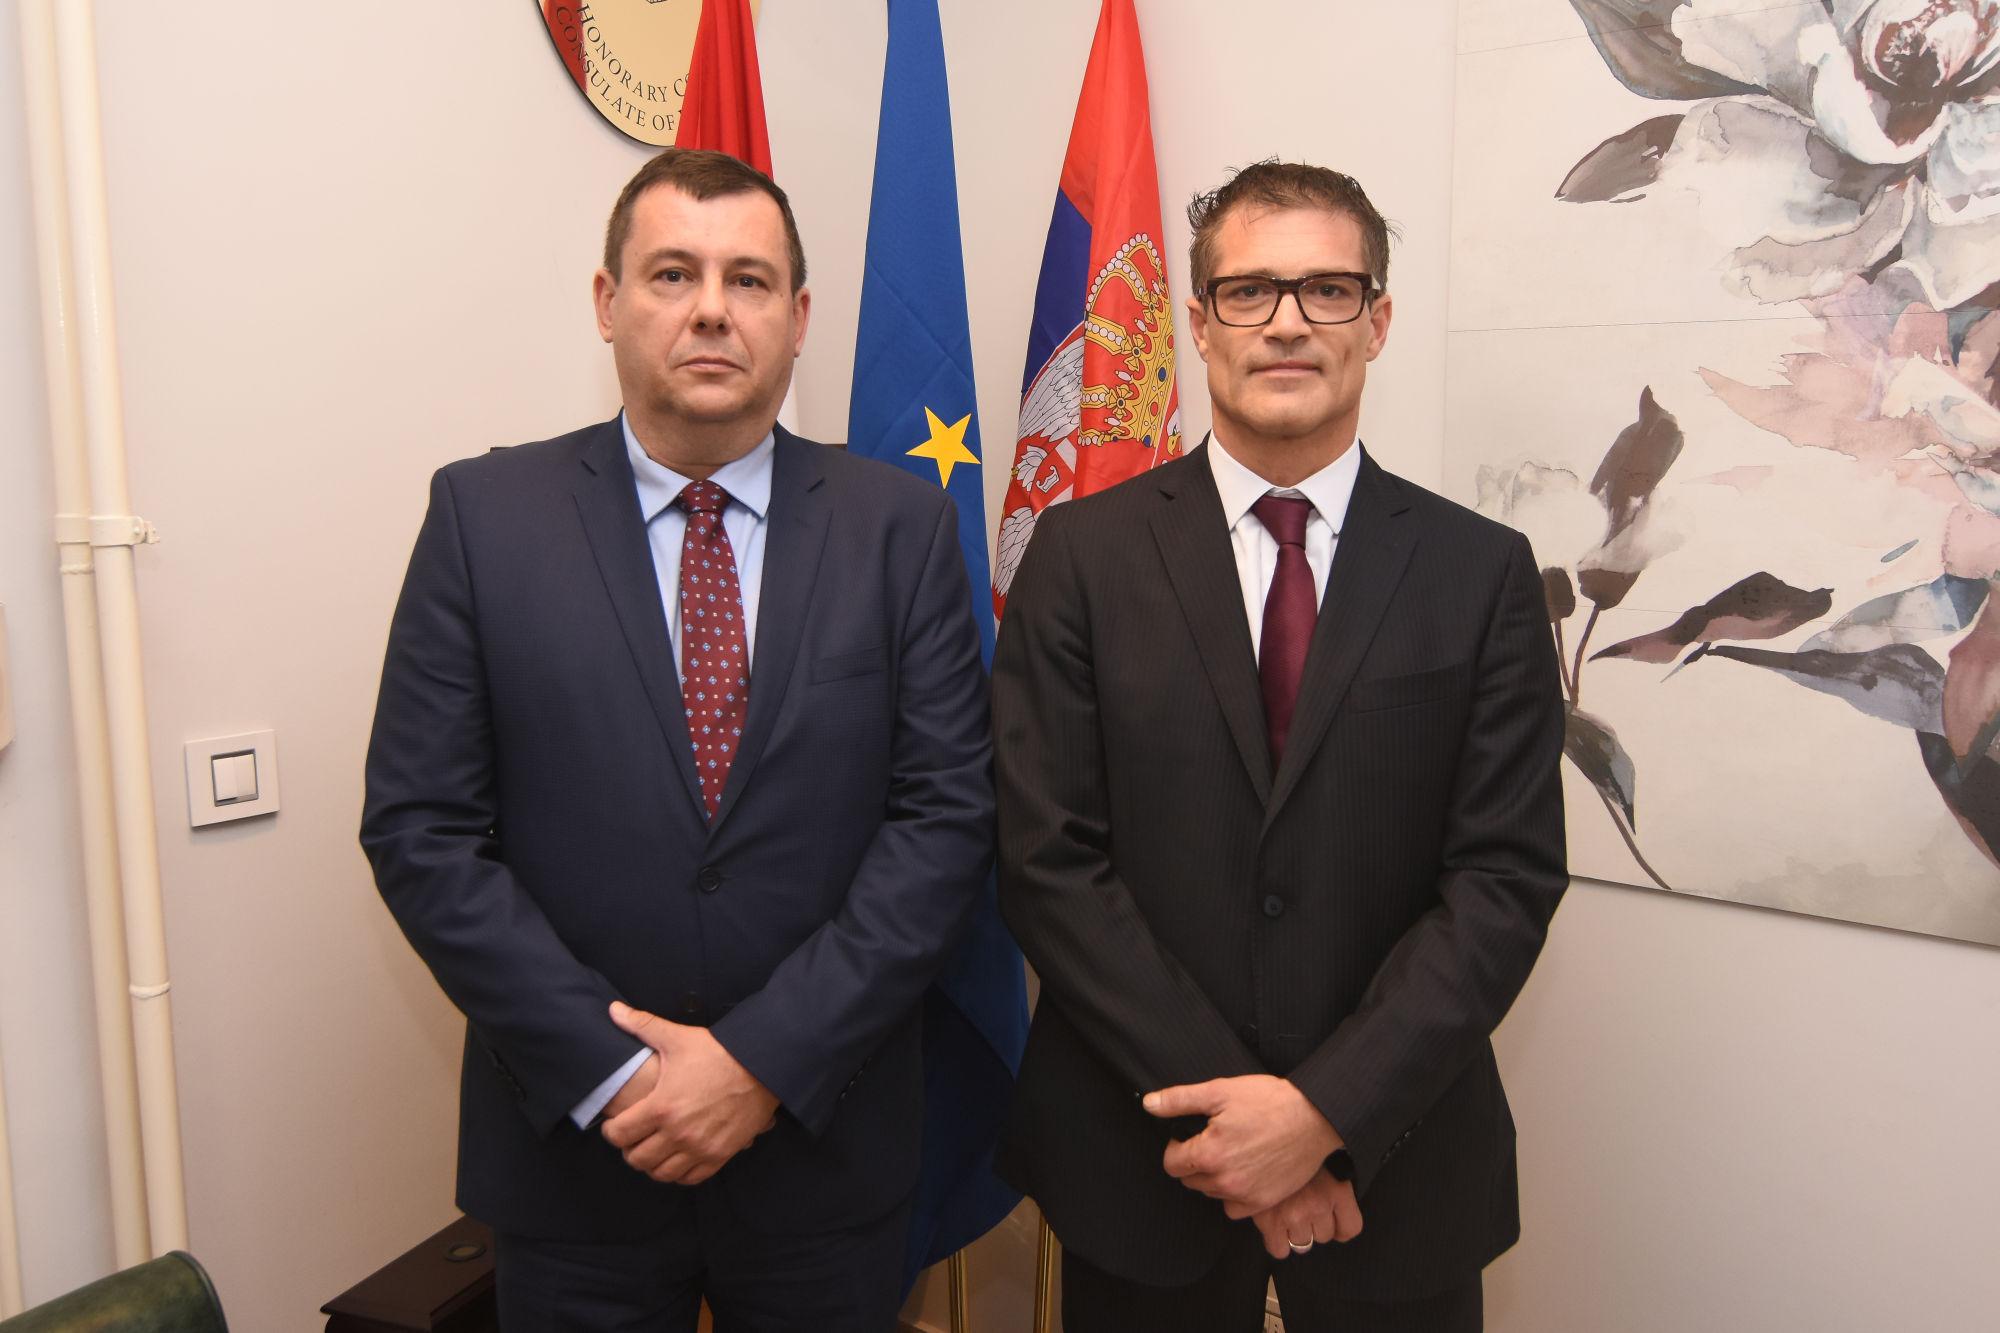 Konzularno predstavništvo Mađarske